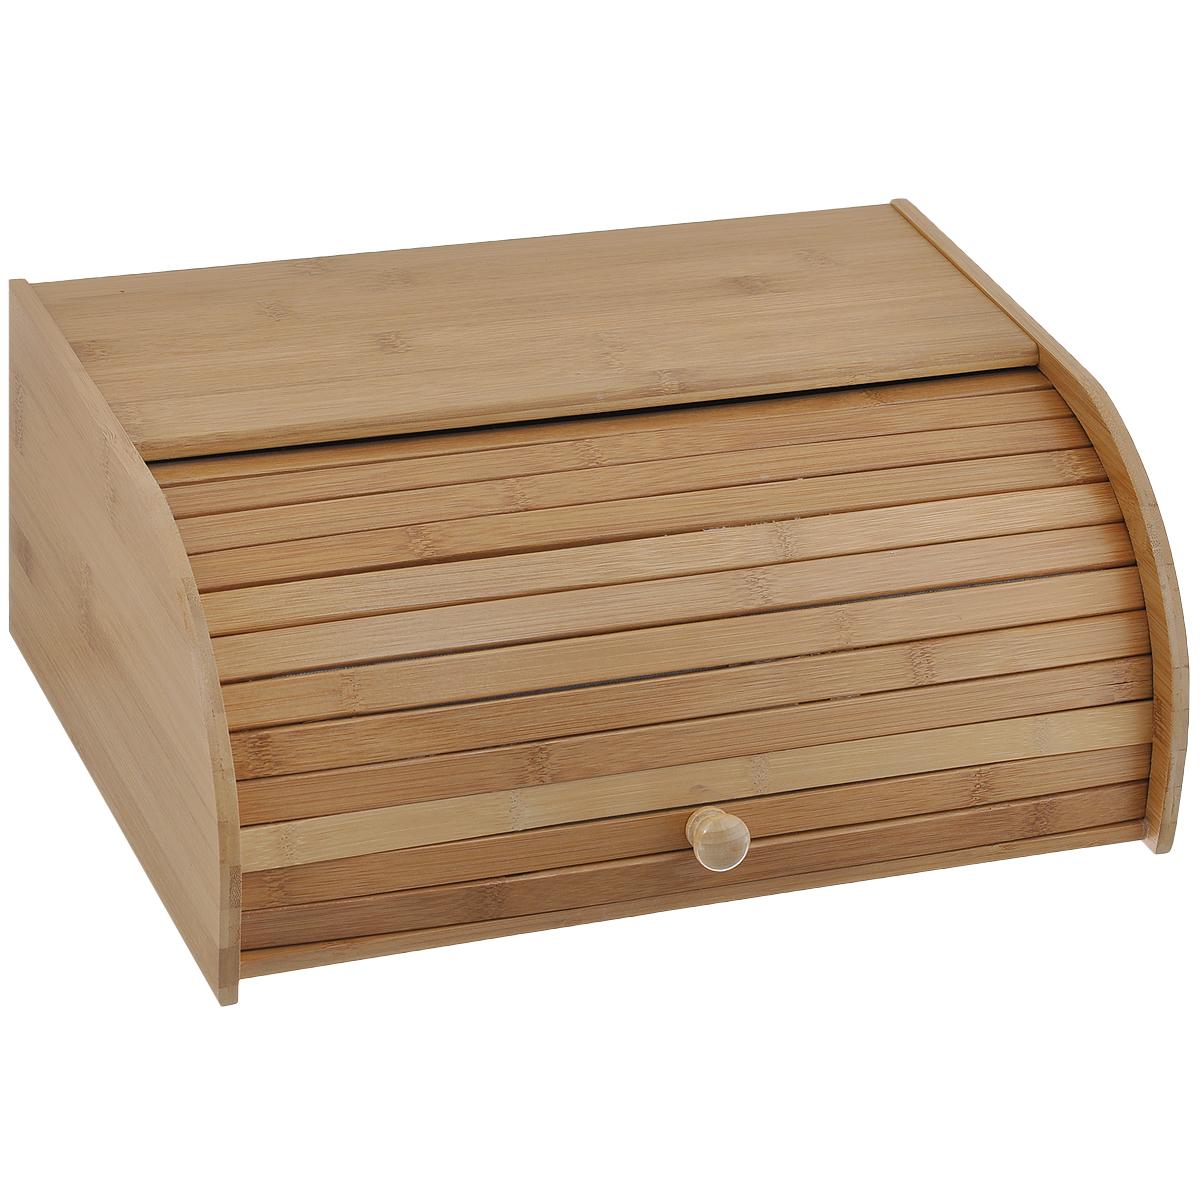 Хлебница Oriental Way, 40 см х 27,5 см х 16,5 см